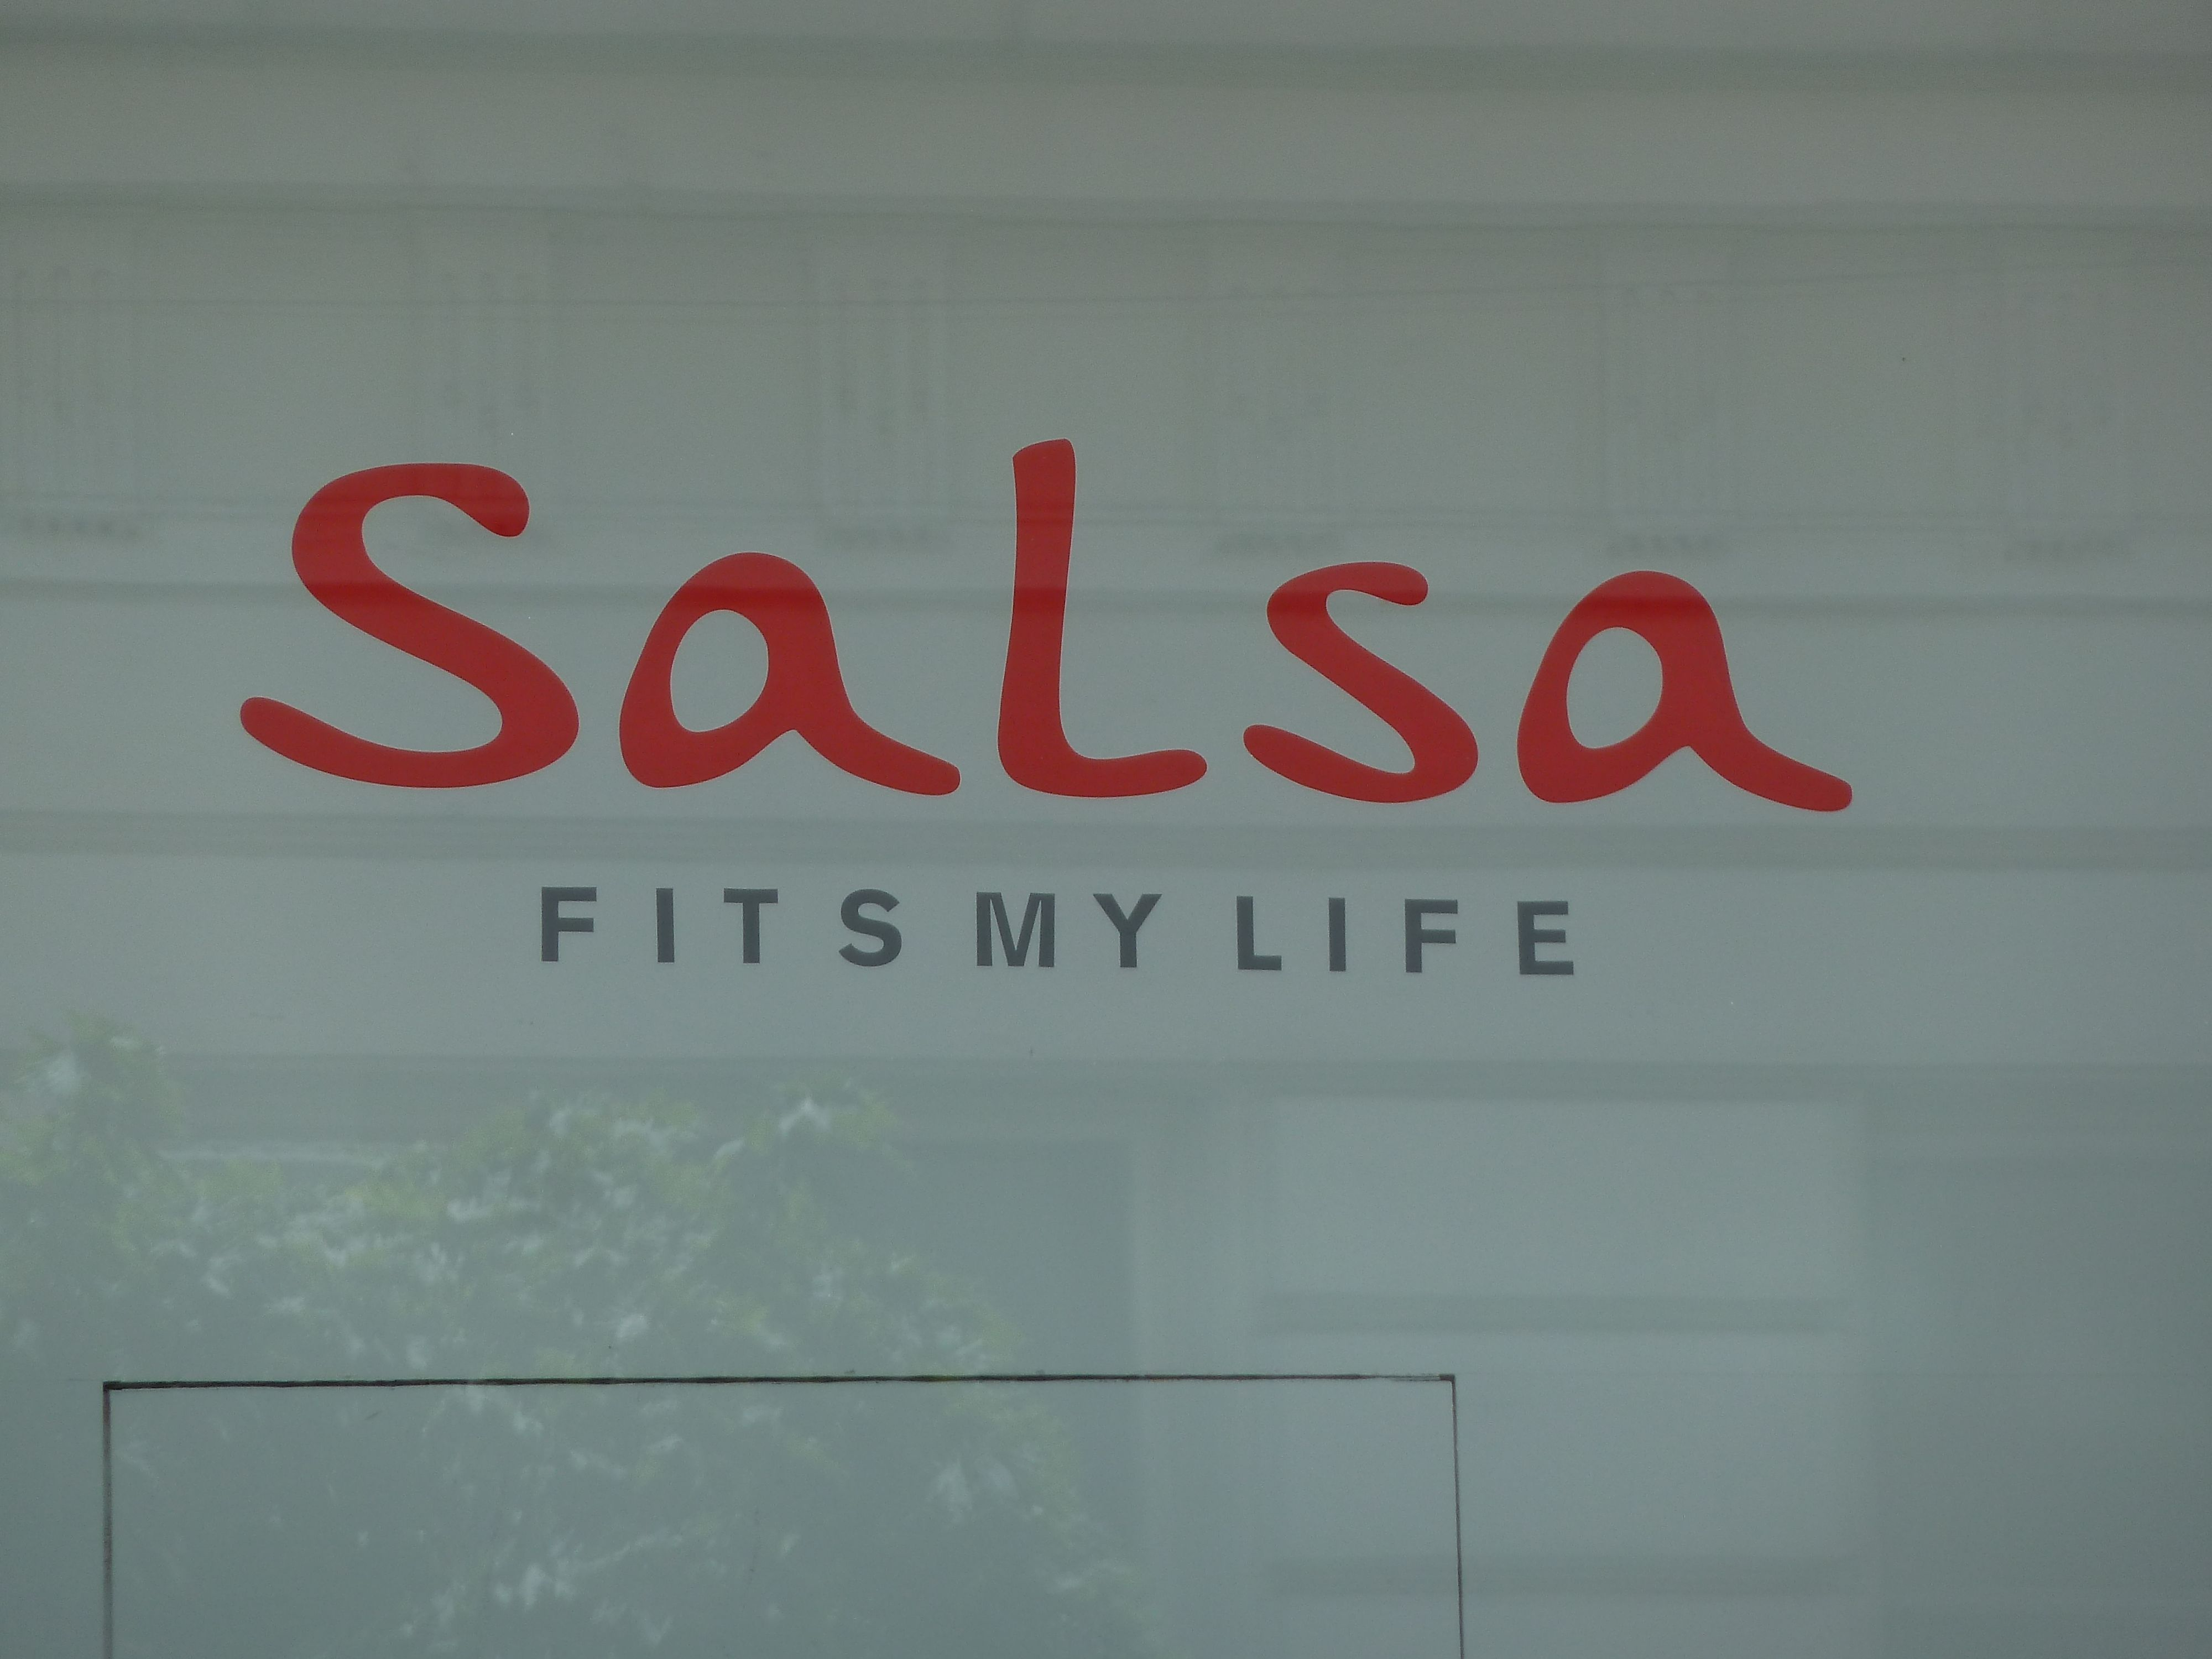 Salsa Fits my life